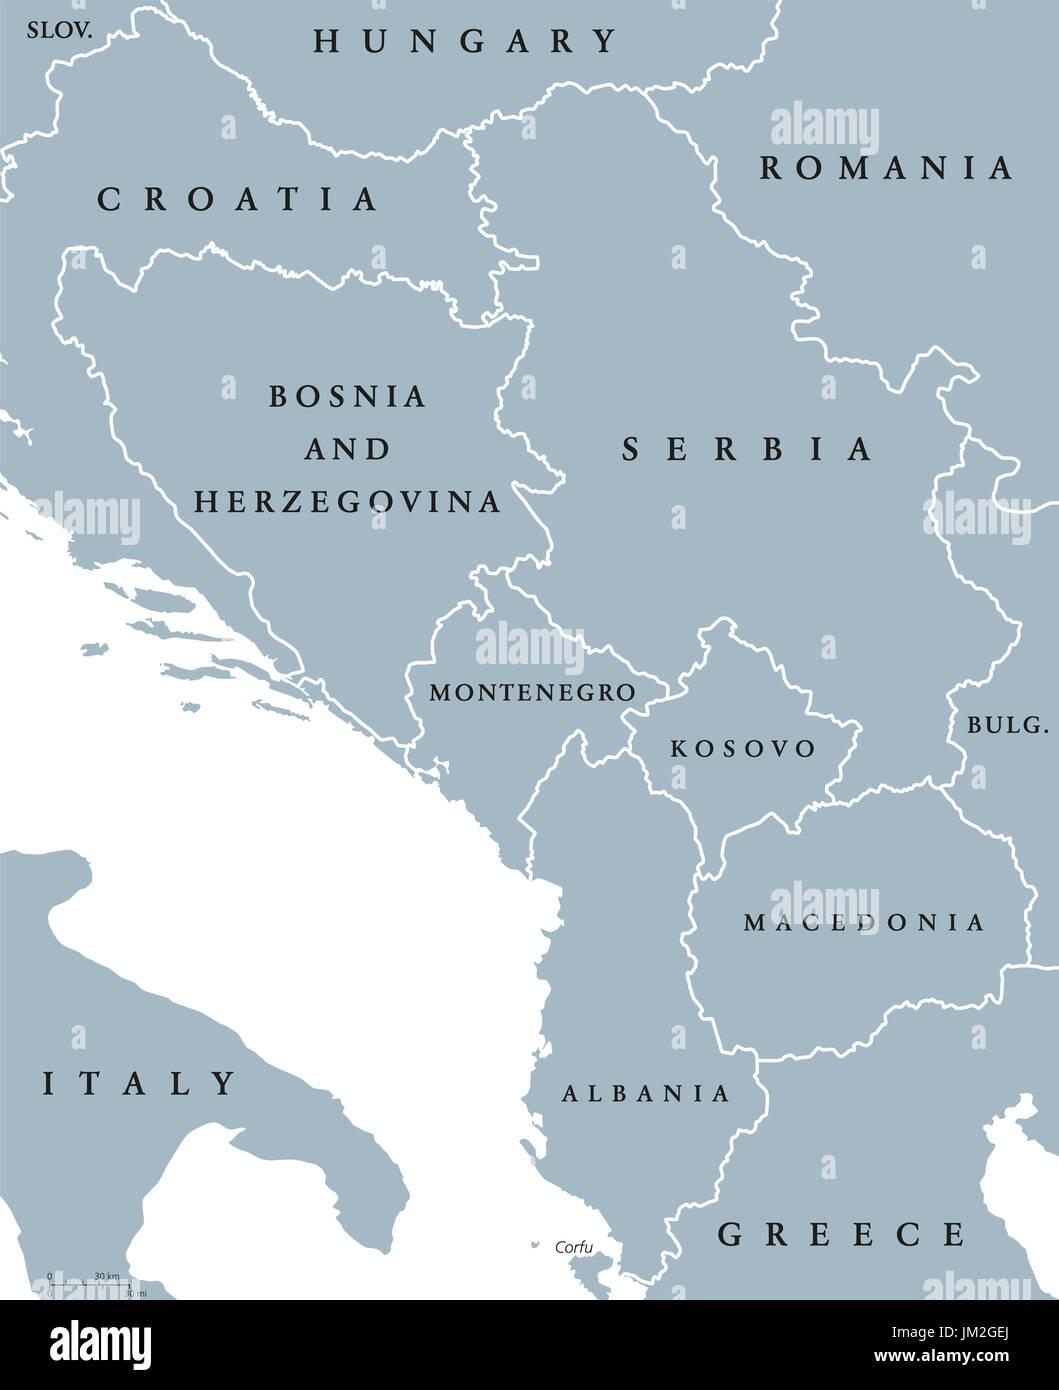 Peninsula In Europe Map.Balkan Peninsula Europe Map 59467 Loadtve